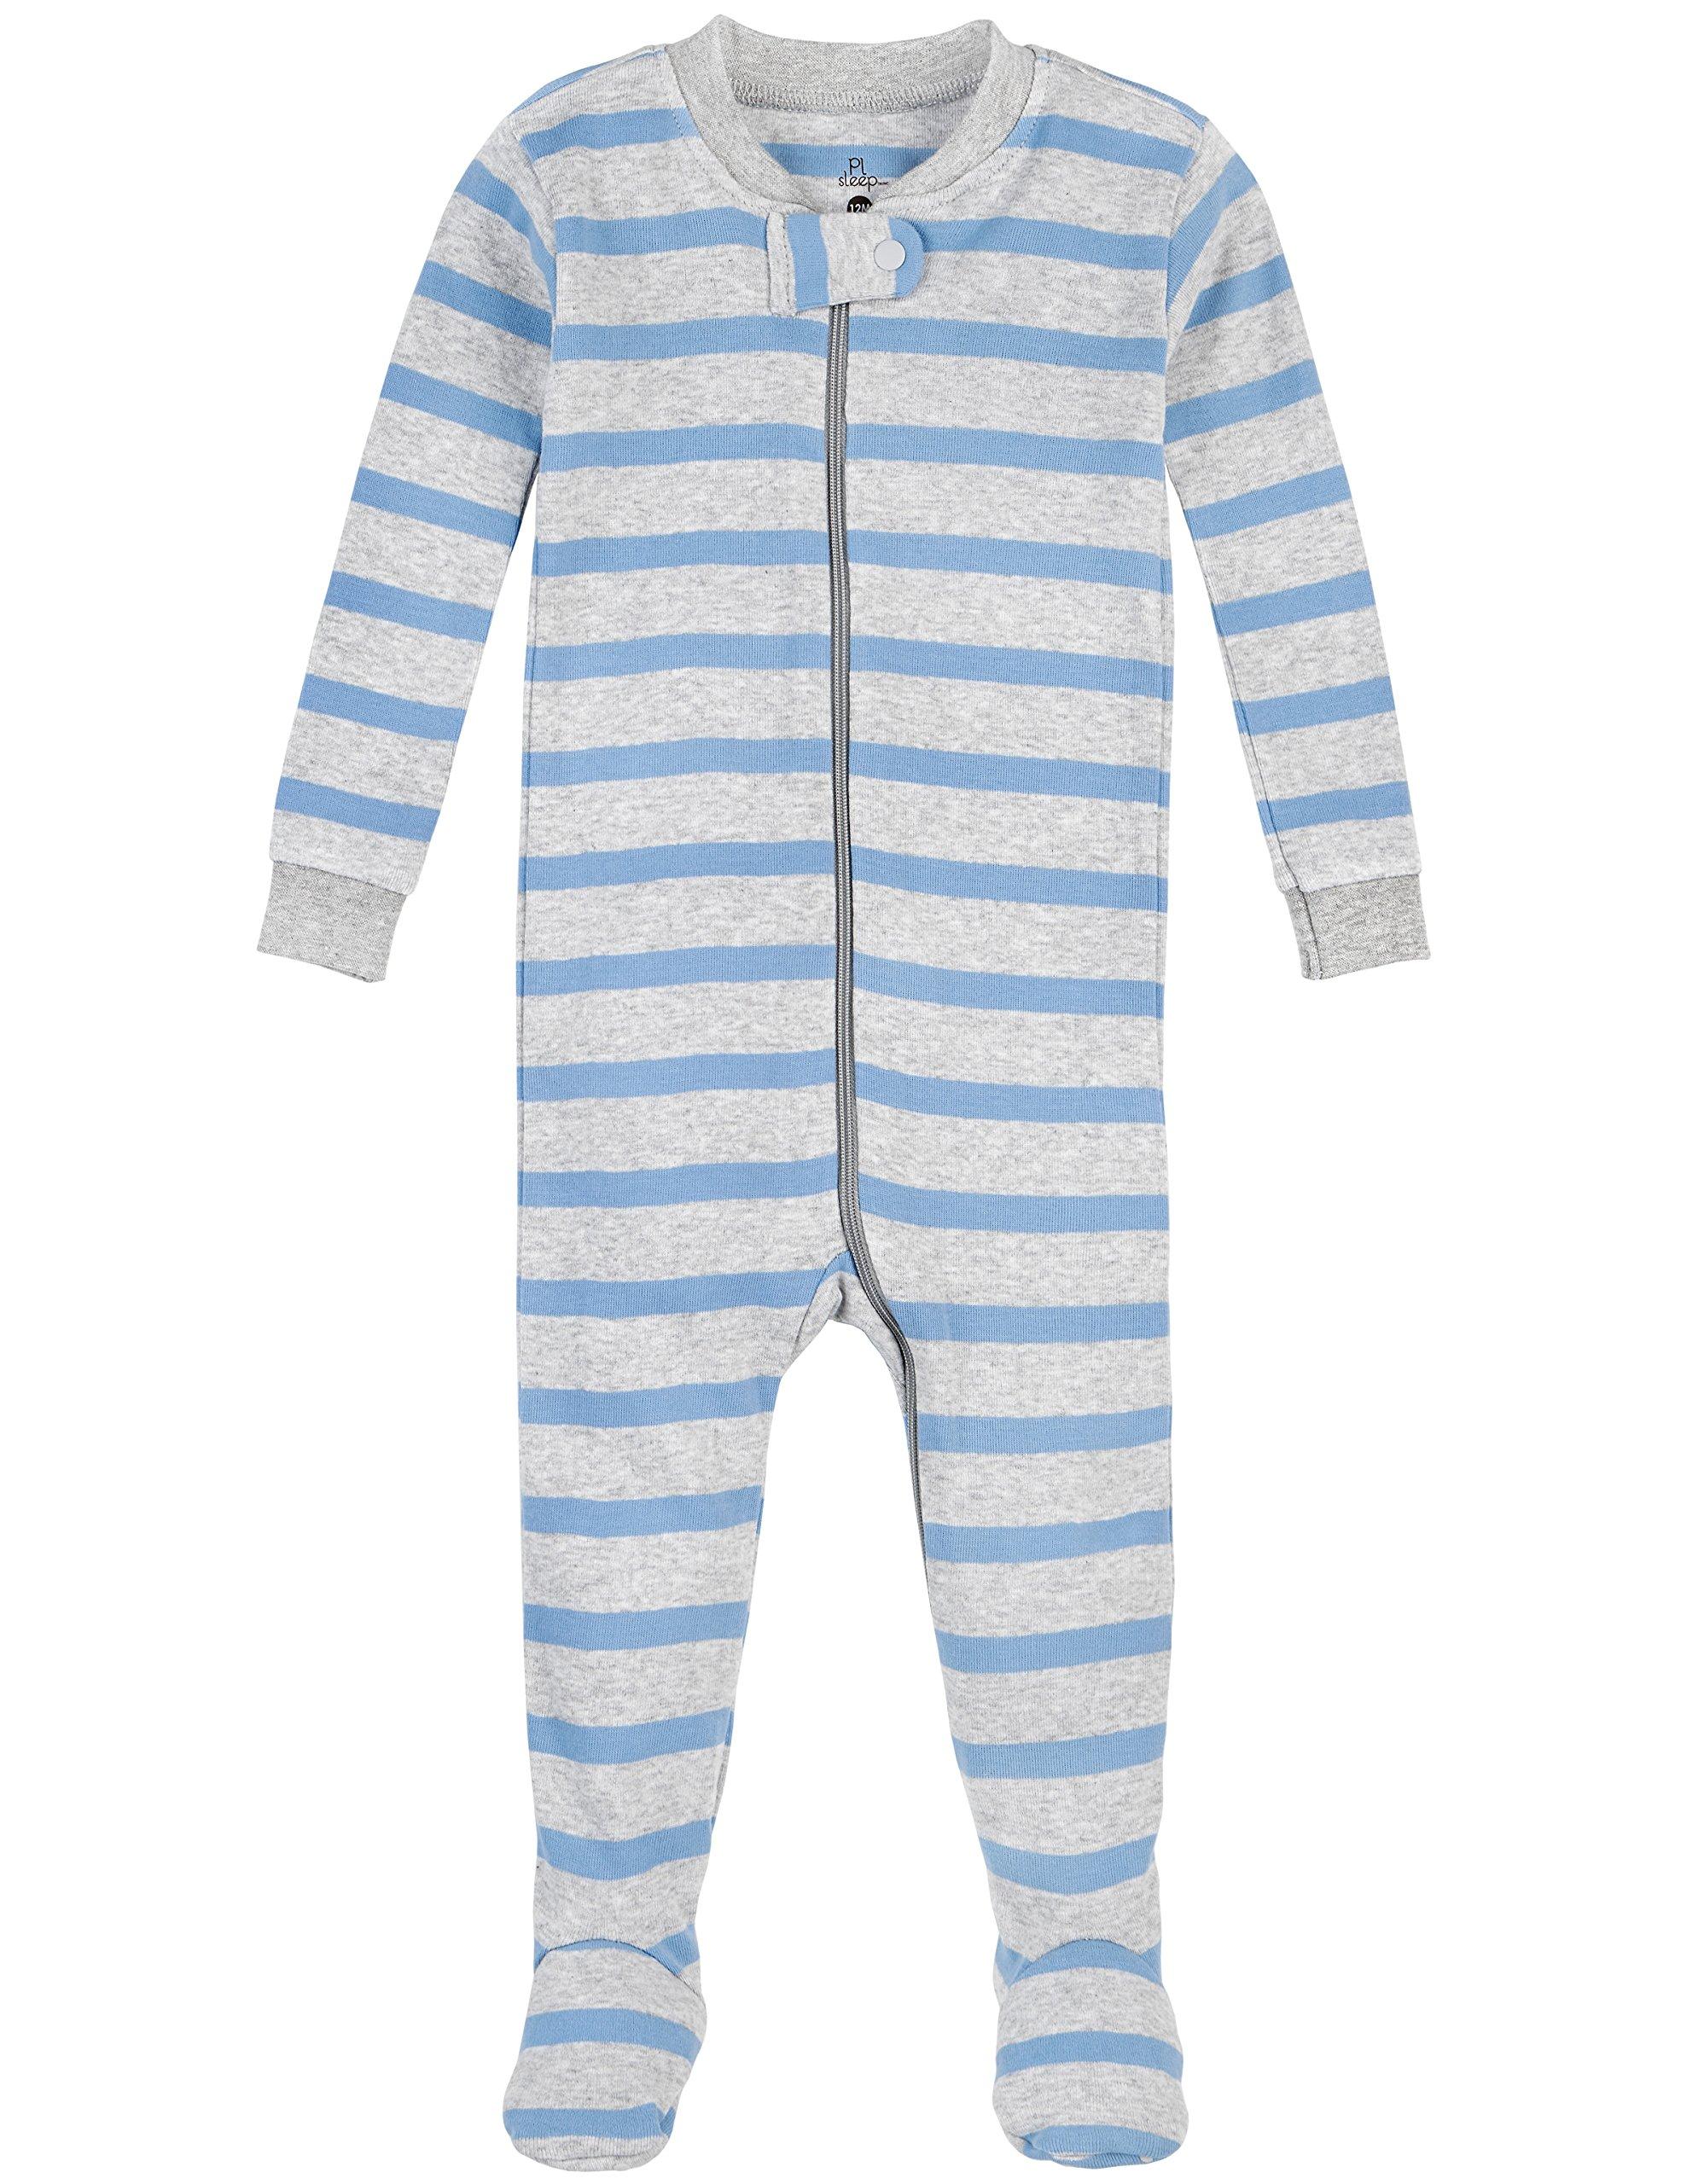 Petit Lem Boys' Sky Stripe 1 Piece Footie Pajama, Blue/Grey, 24M by Petit Lem